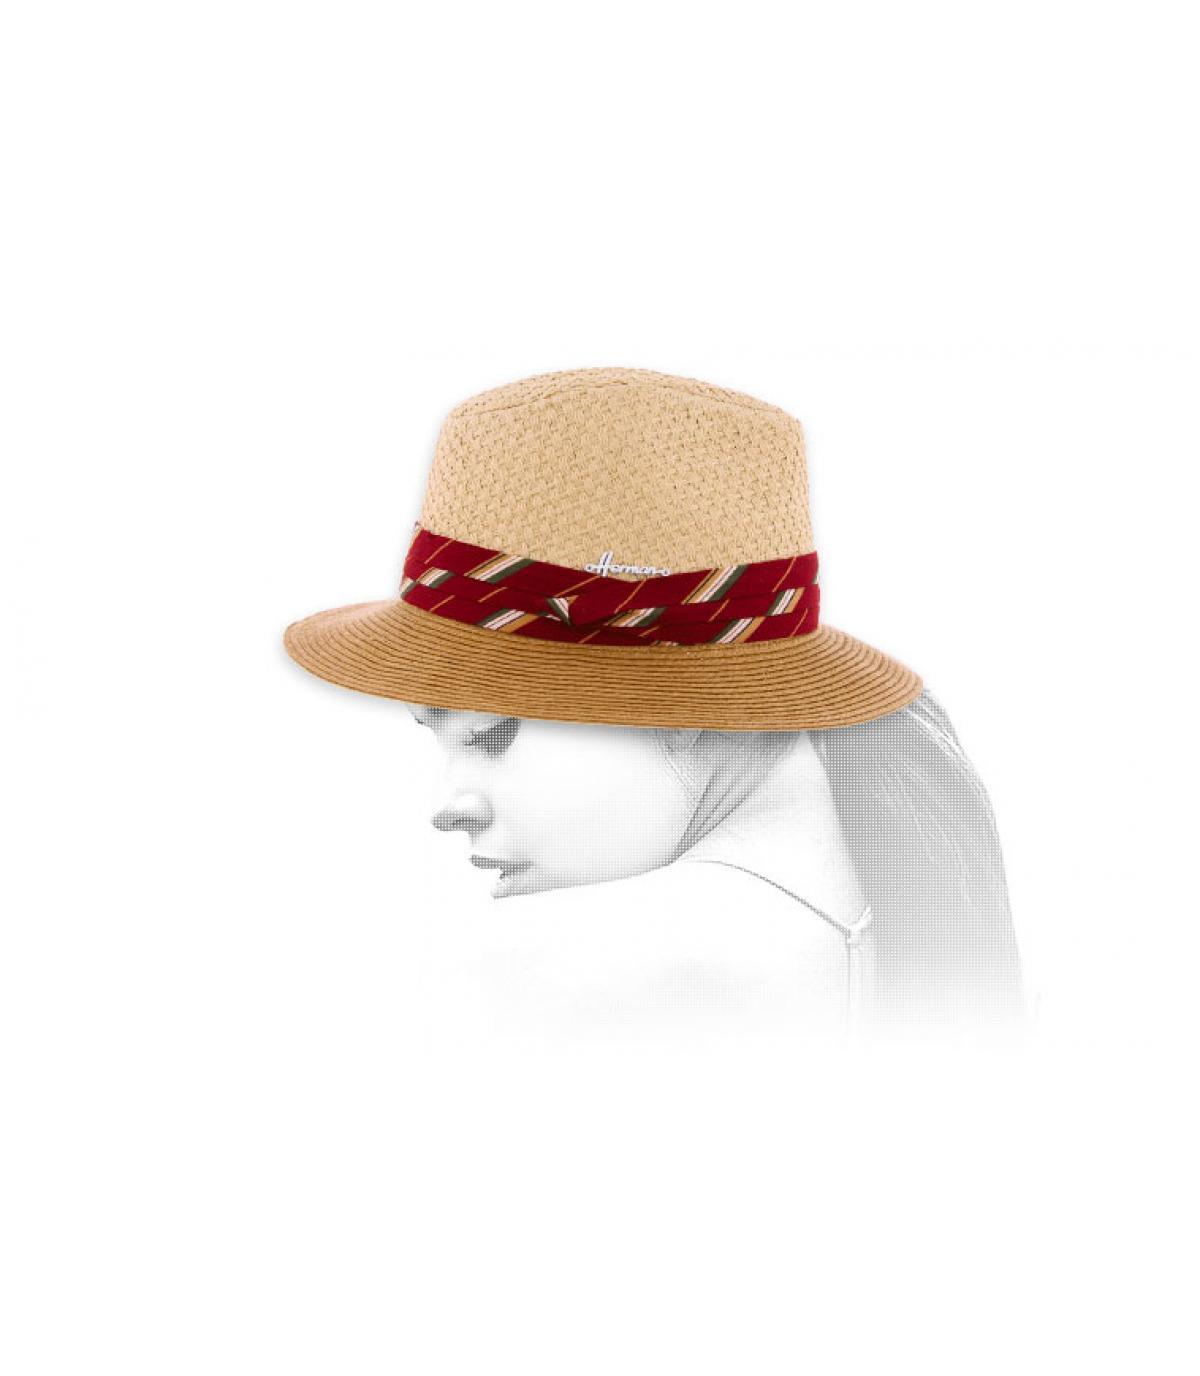 Strohhut zweifarbig rotes Hutband